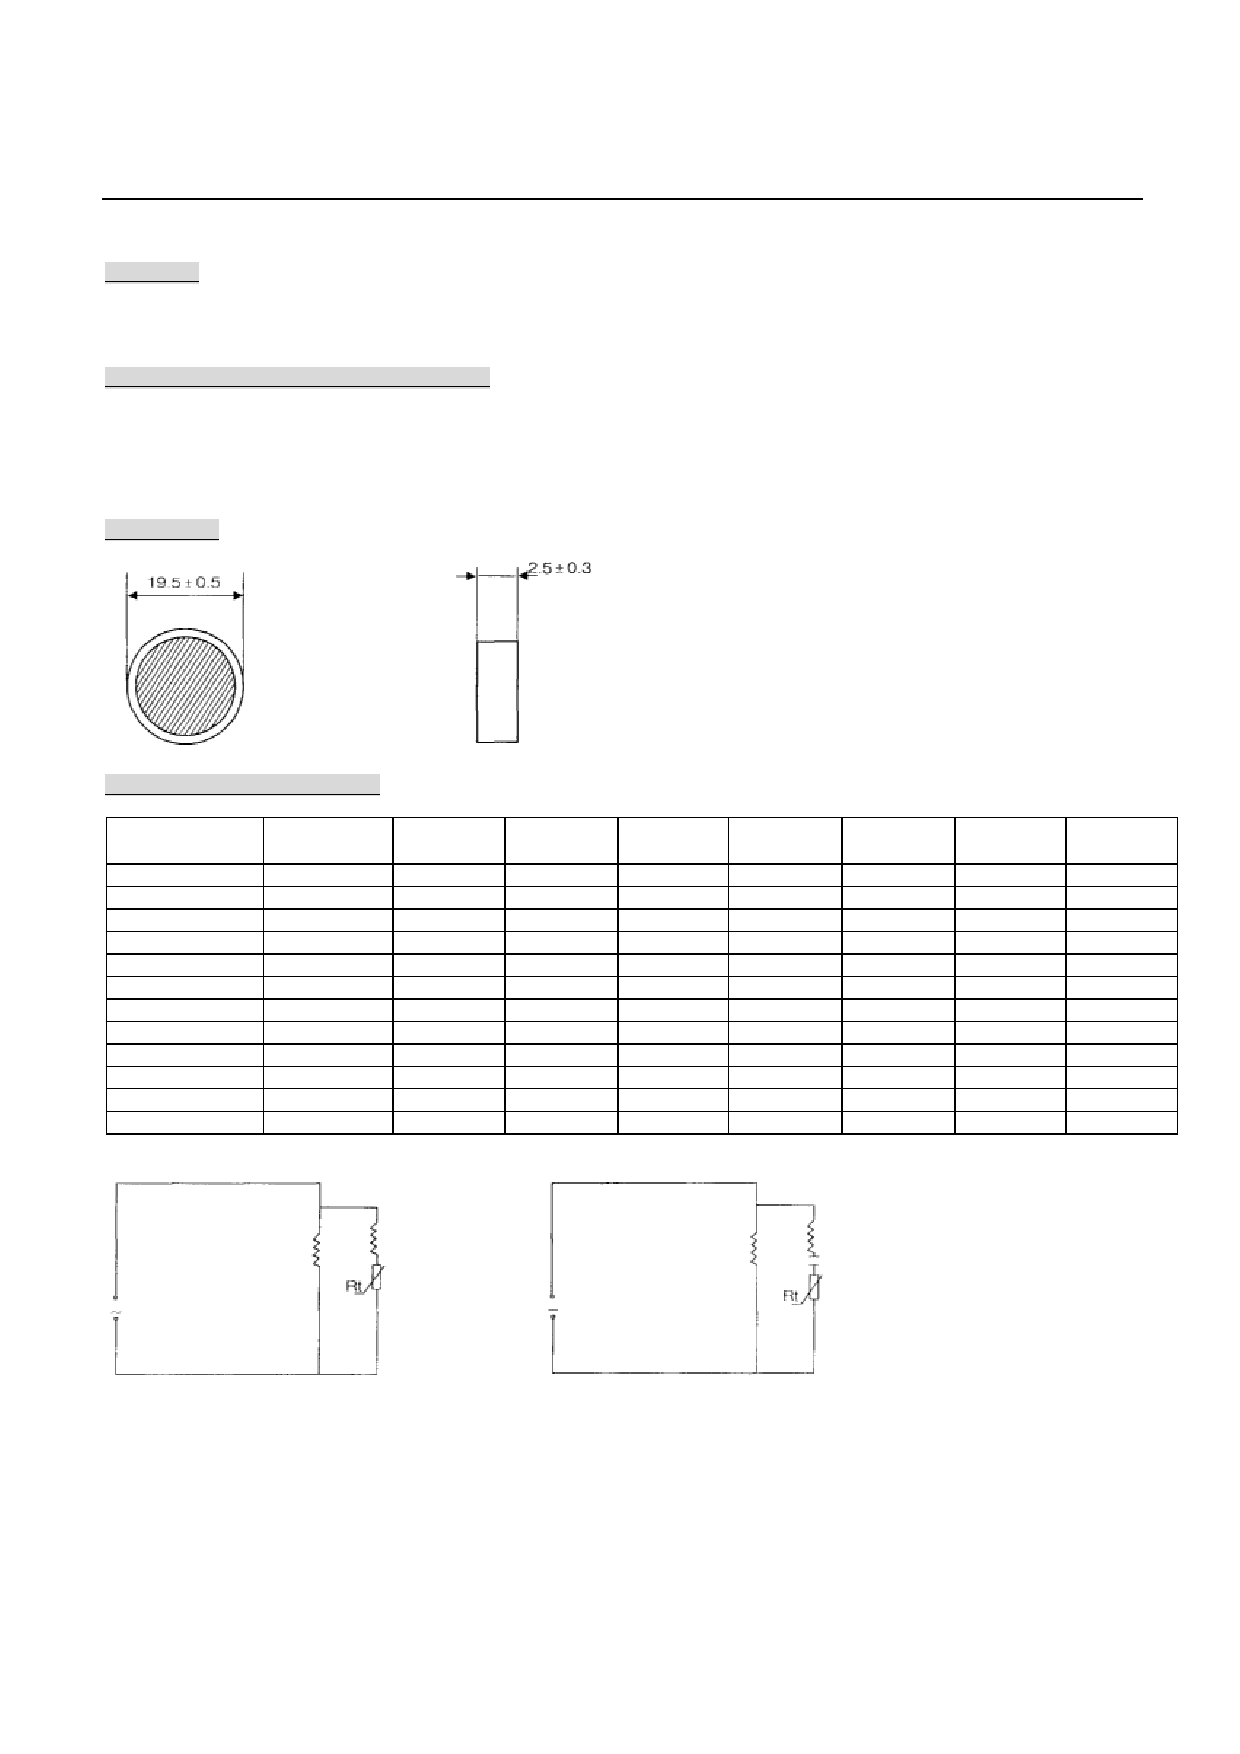 MZ73-9RM pdf, schematic